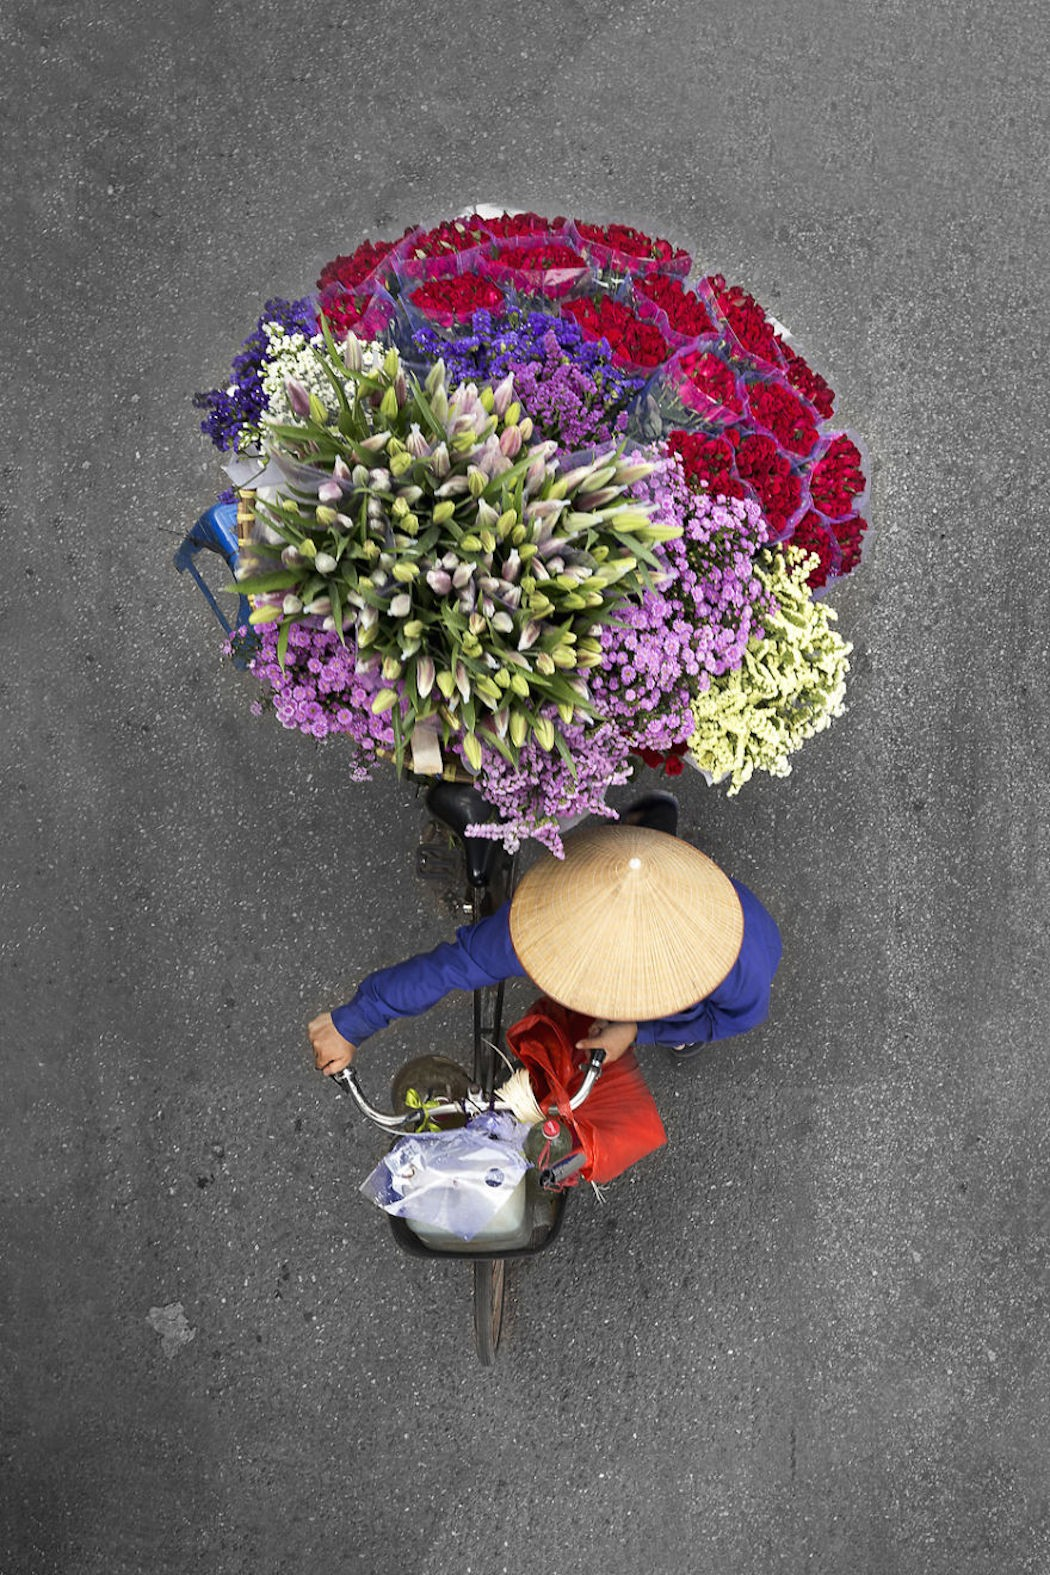 Photography_VendorsFromAbove_LoesHeerink_02-1050x1575.jpg